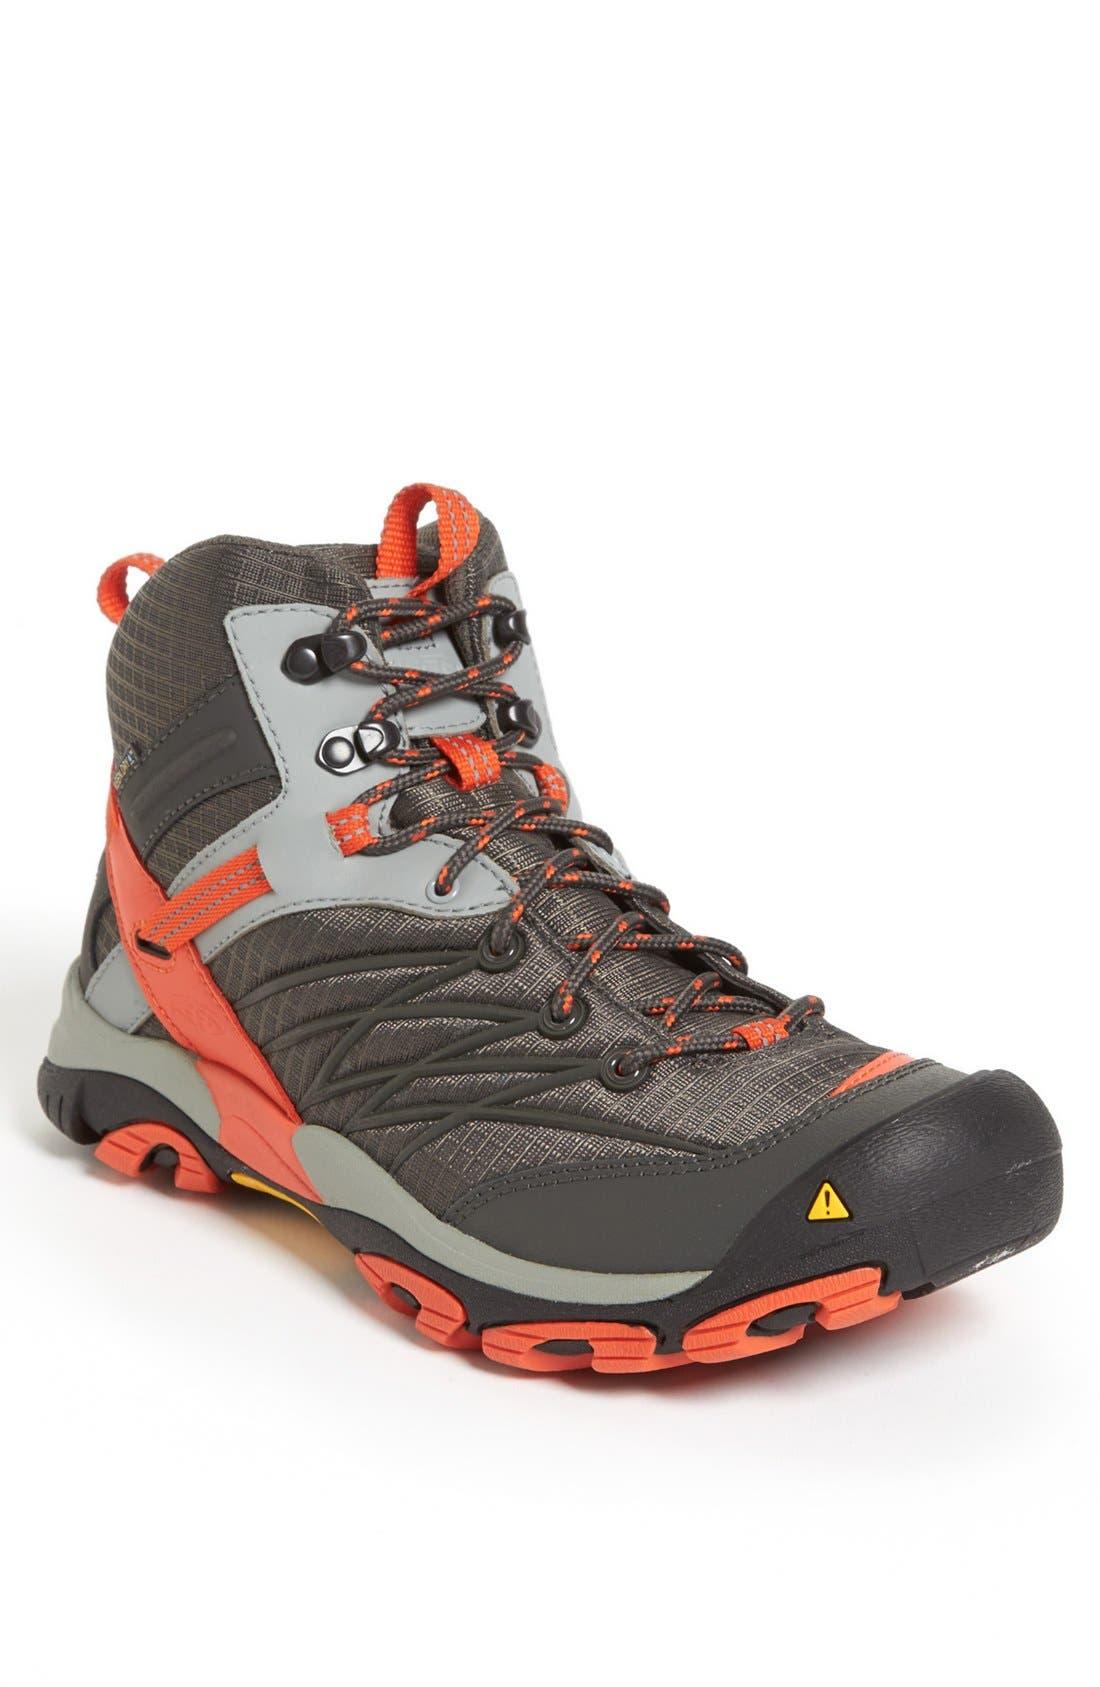 Main Image - Keen 'Marshall Mid WP' Hiking Boot (Men)